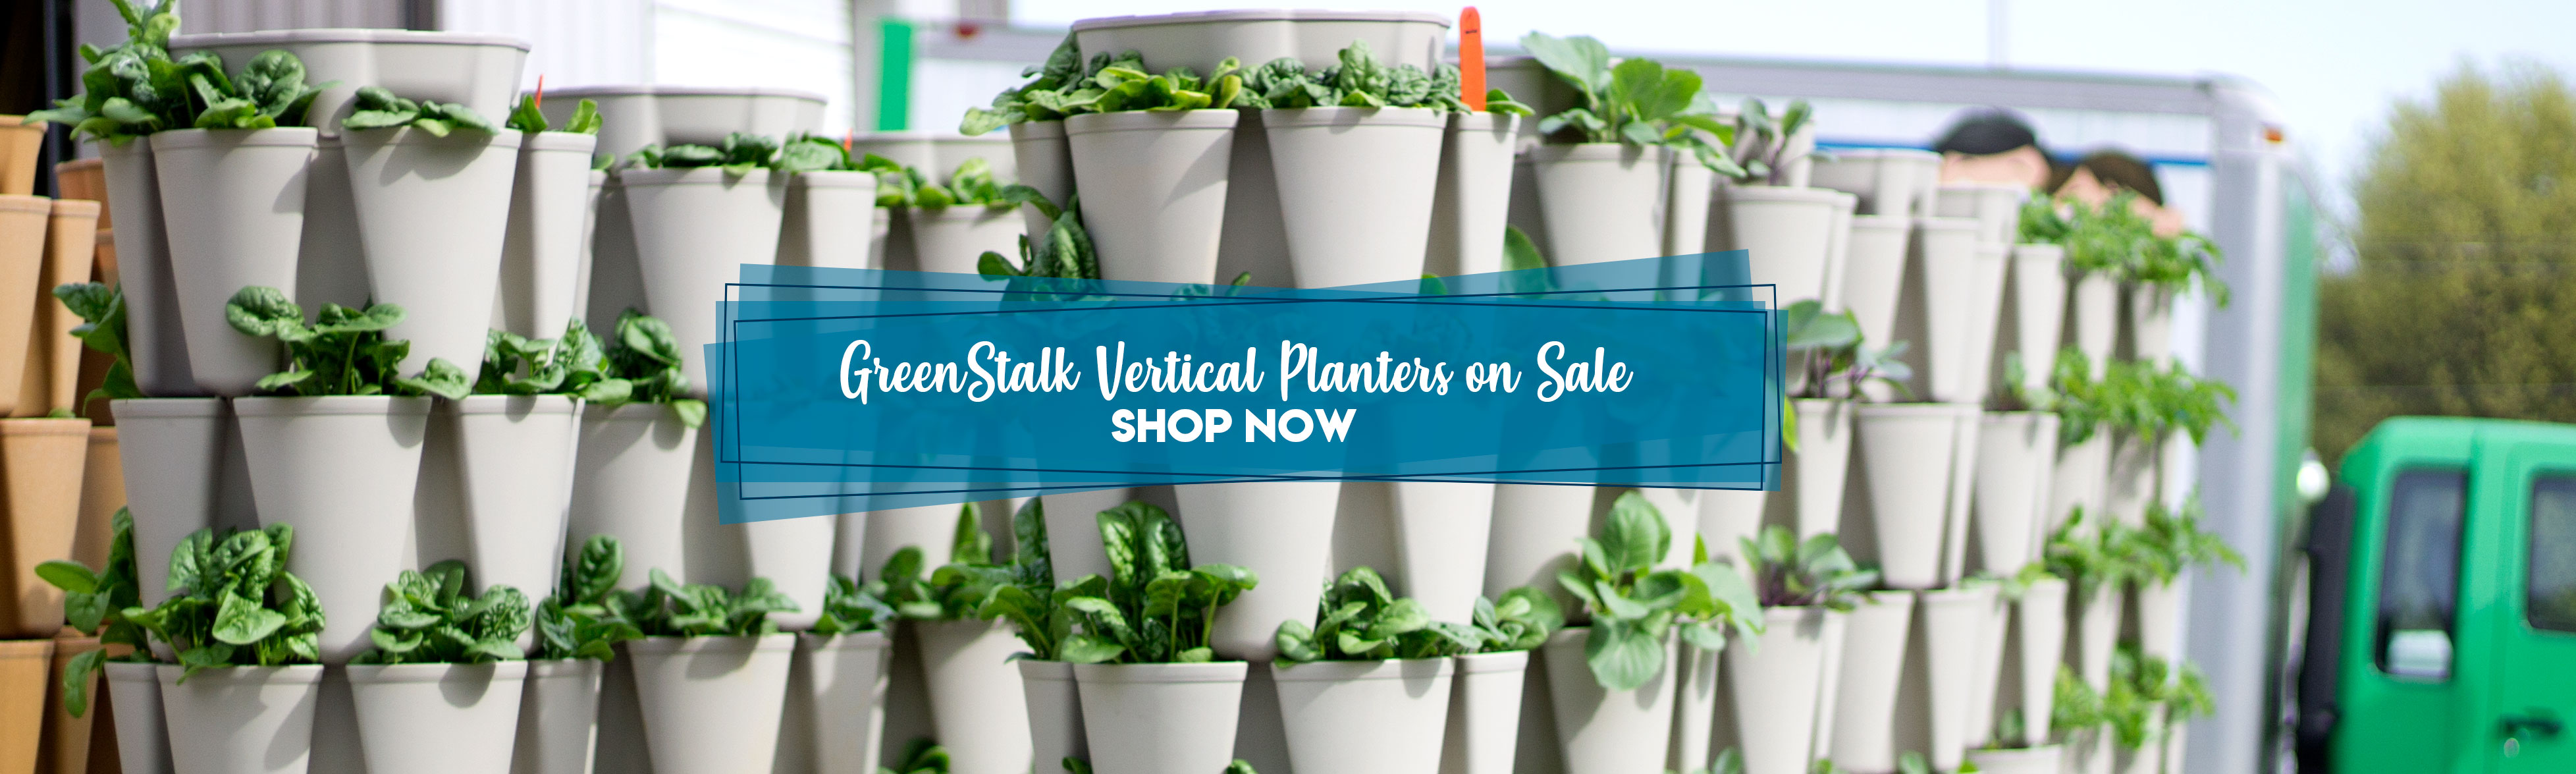 greenstalk-vertical-planters-on-sale-now12.jpg